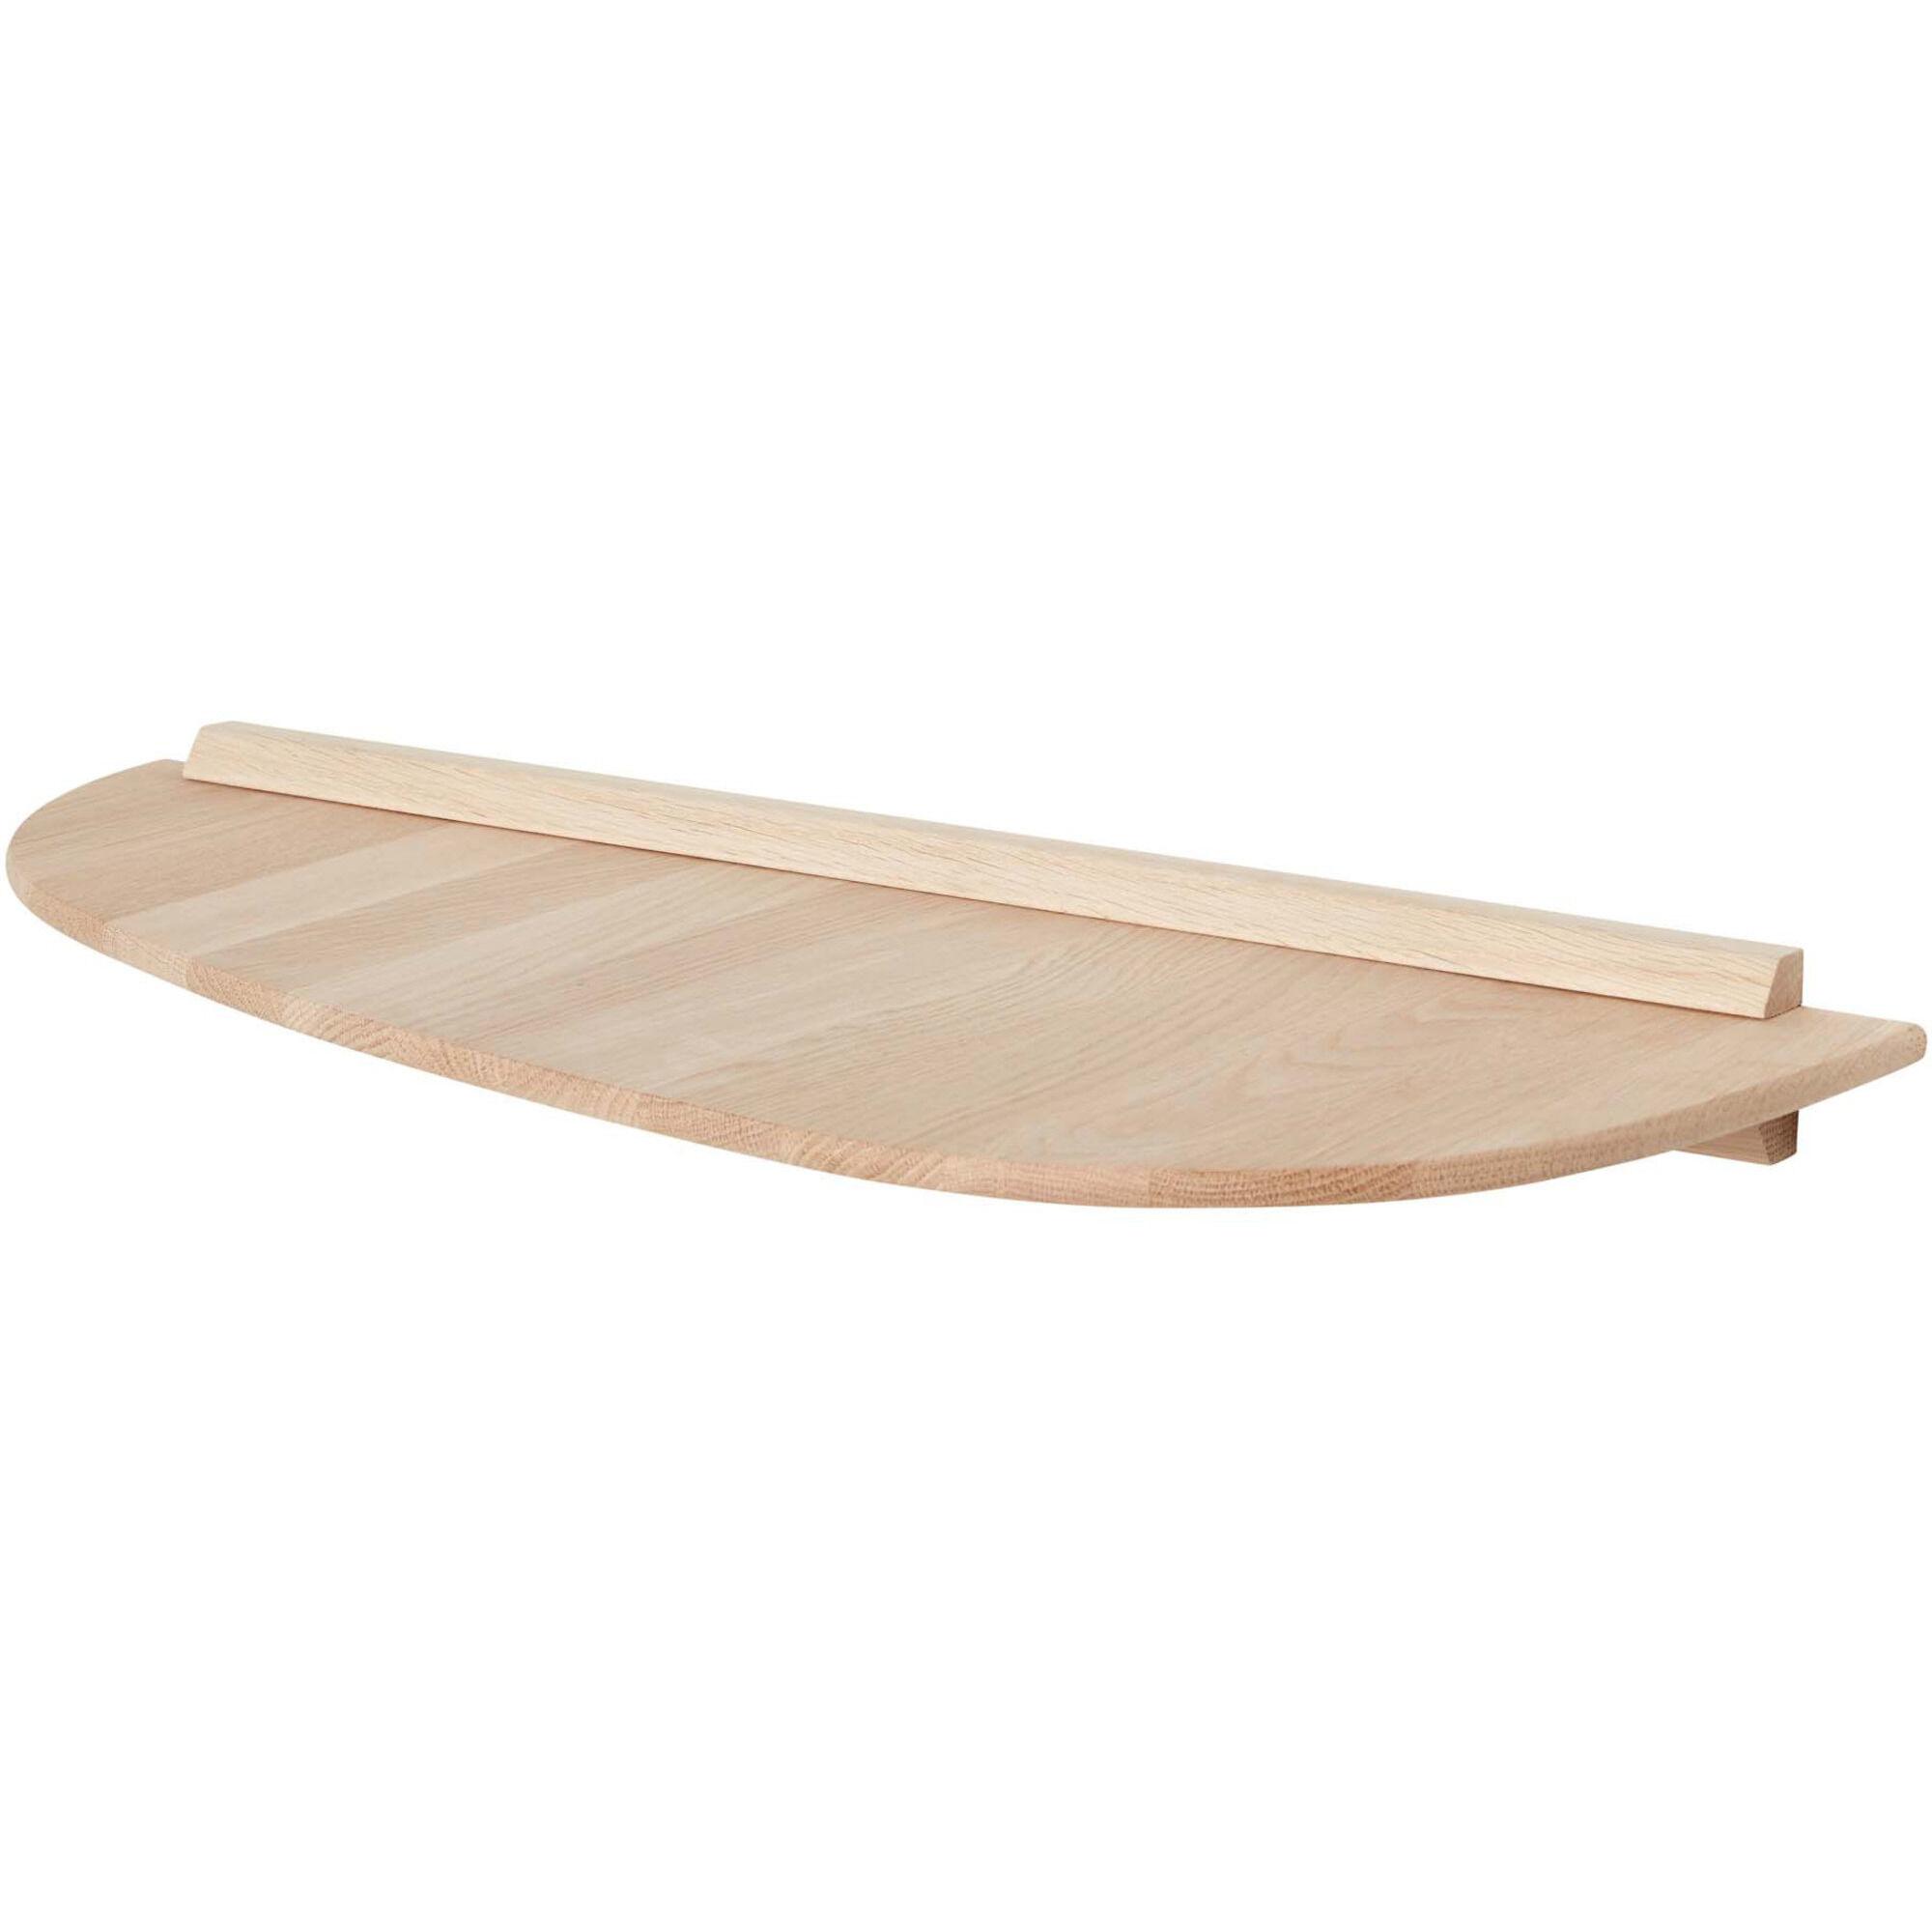 Andersen Furniture Shelf 2 59 x 25 cm Oak Hylle